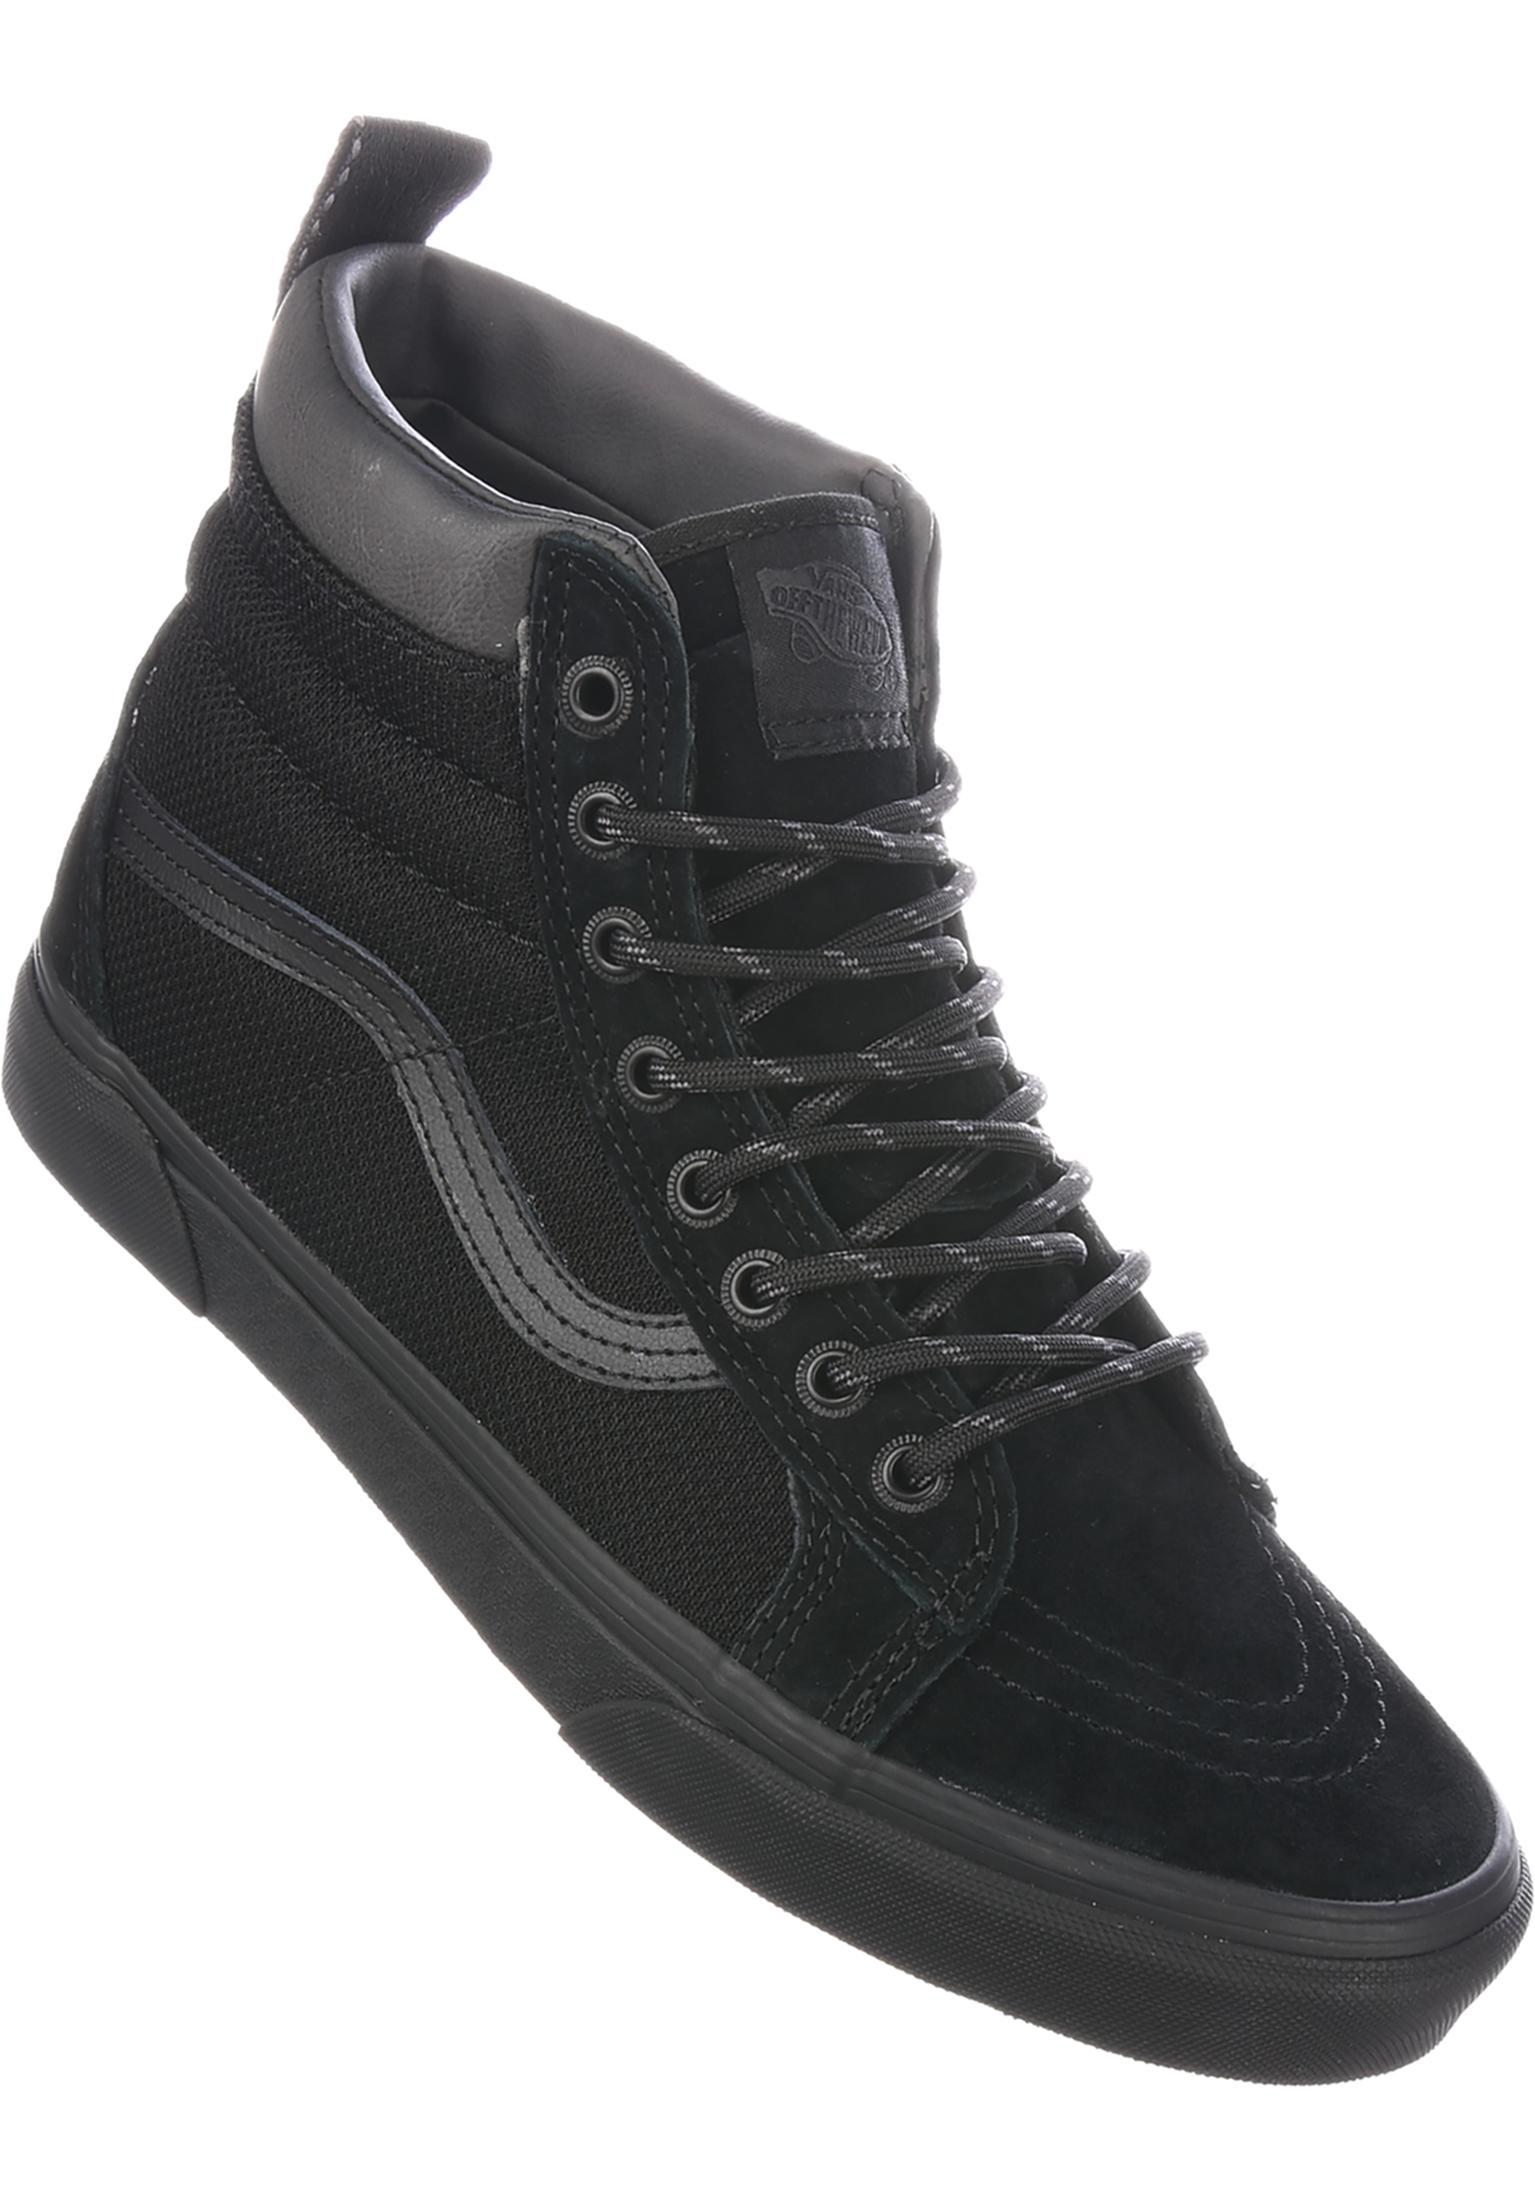 e7cfc15886 Sk8 Hi MTE Vans All Shoes in black-ballistic for Men